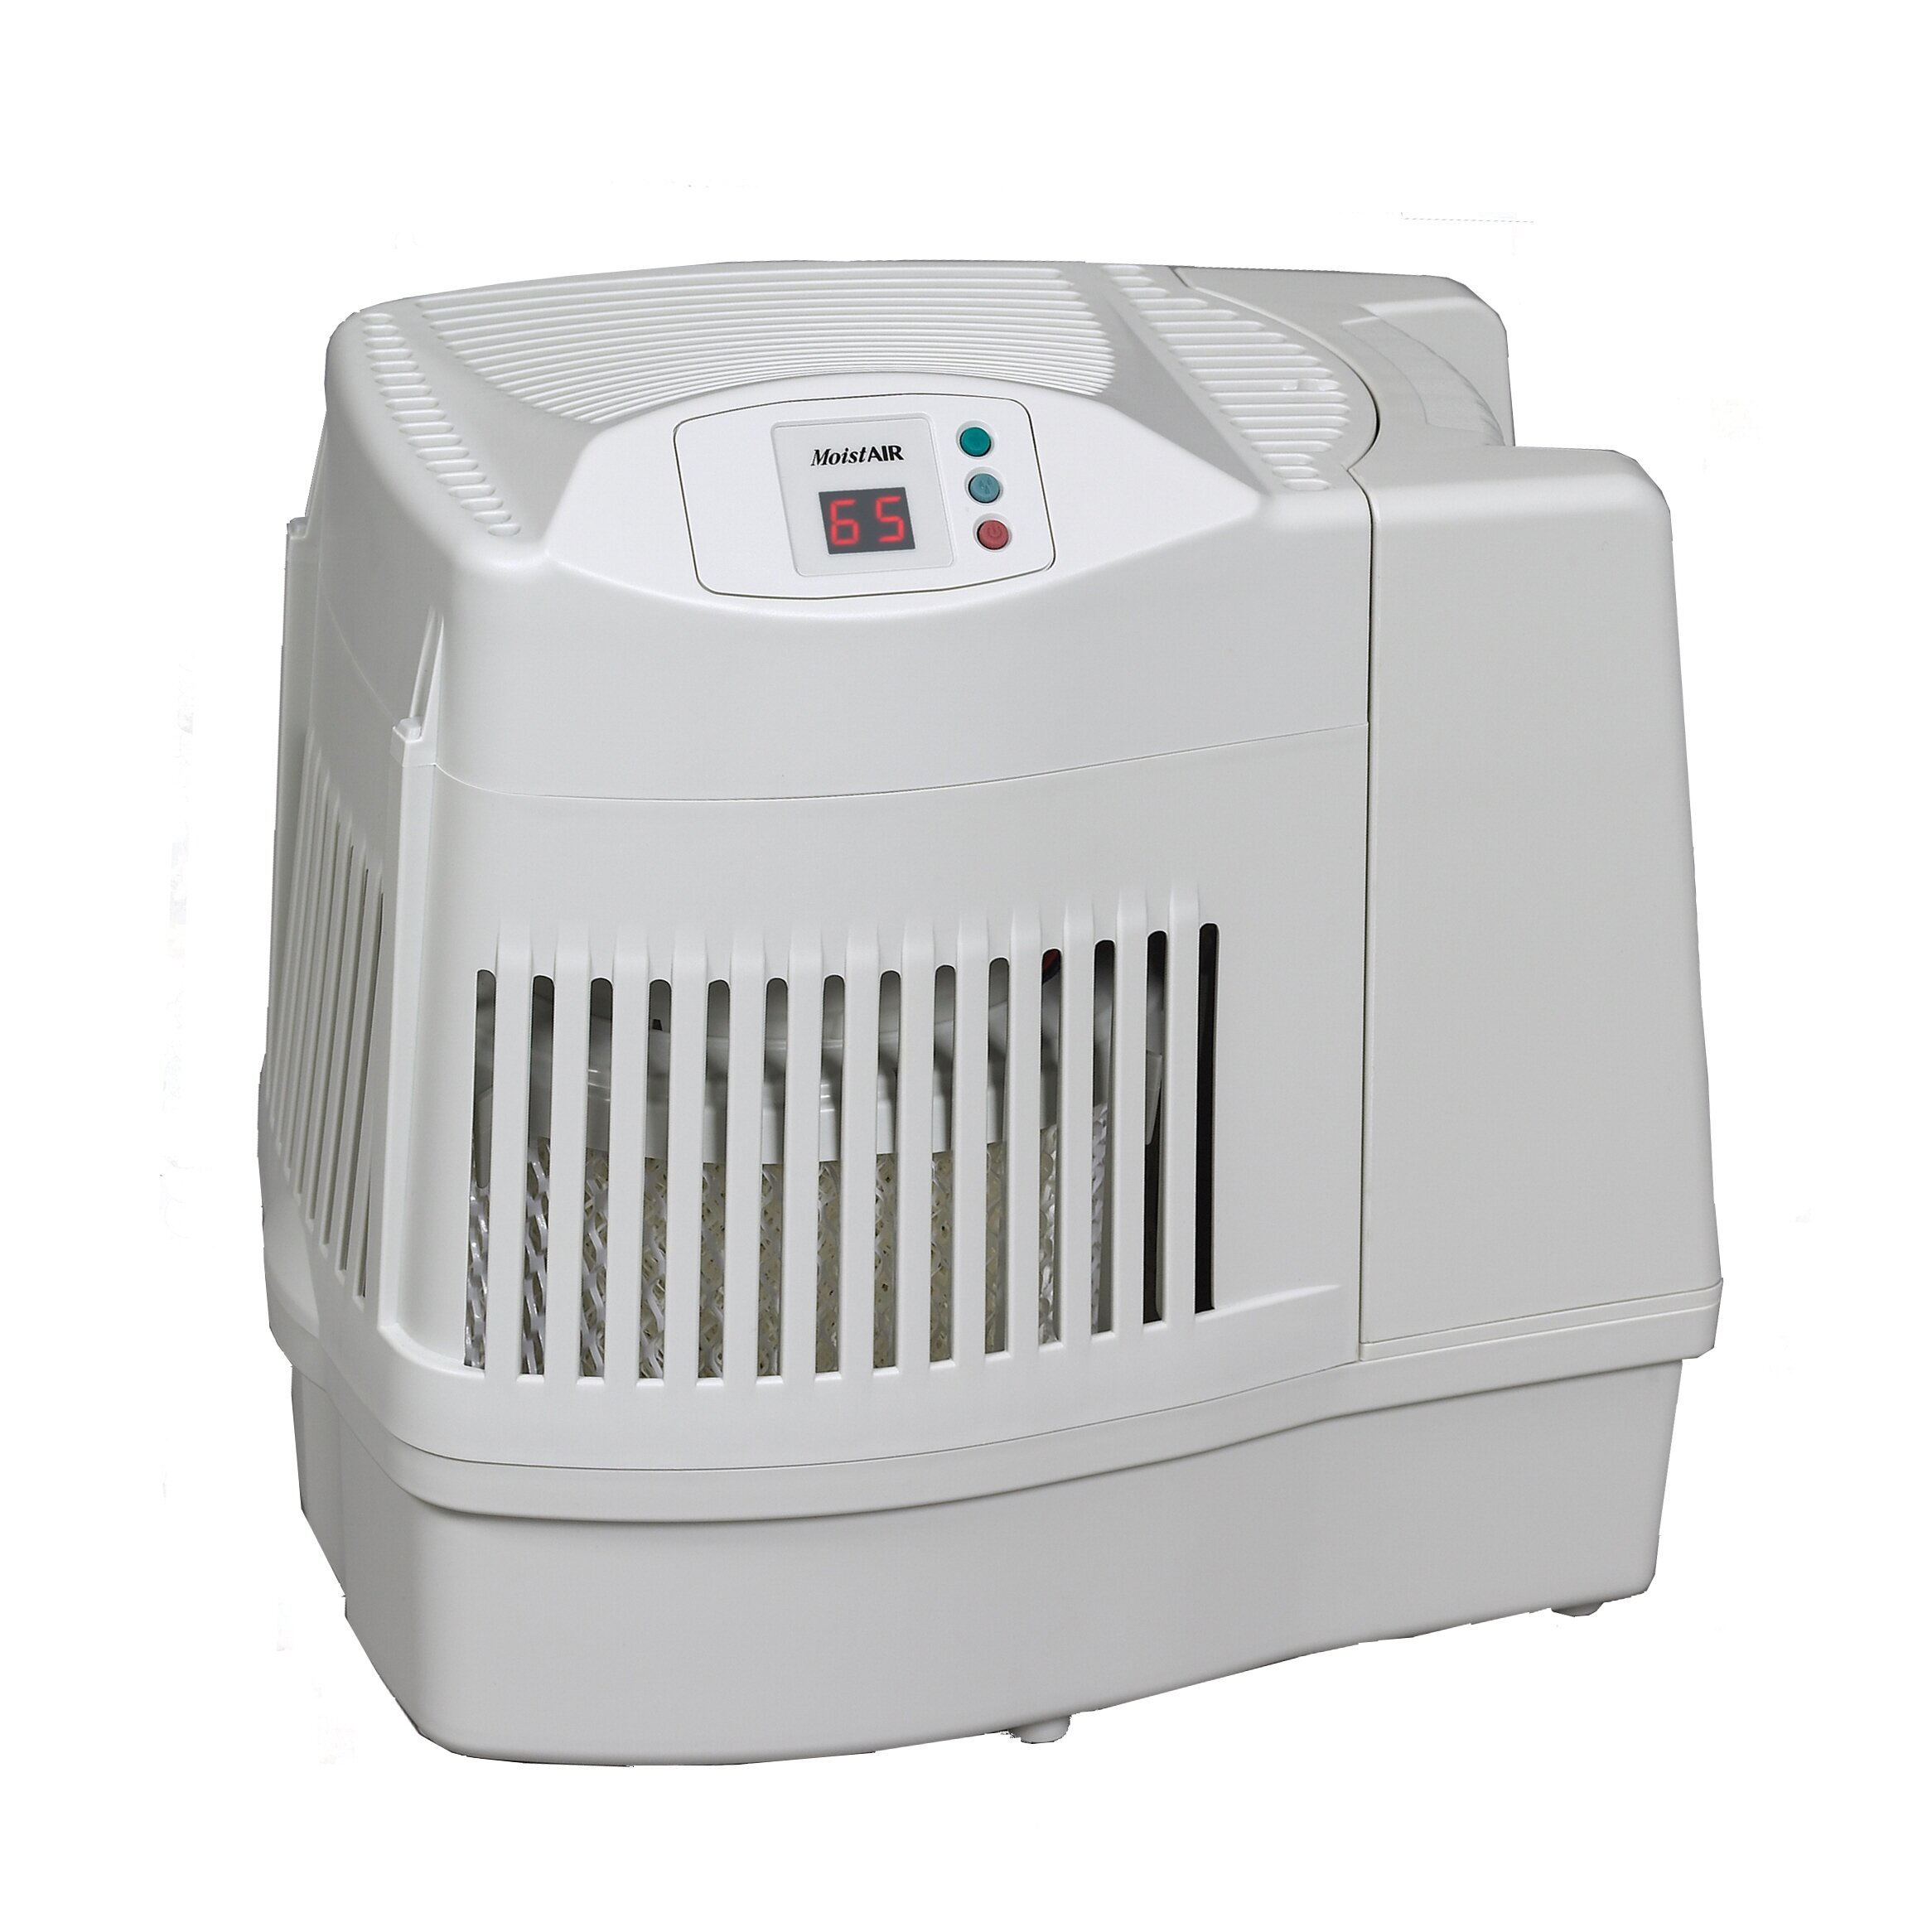 Bedroom Humidifiers Aircare 2 26 Gal Evaporative Humidifier Amp Reviews Wayfair